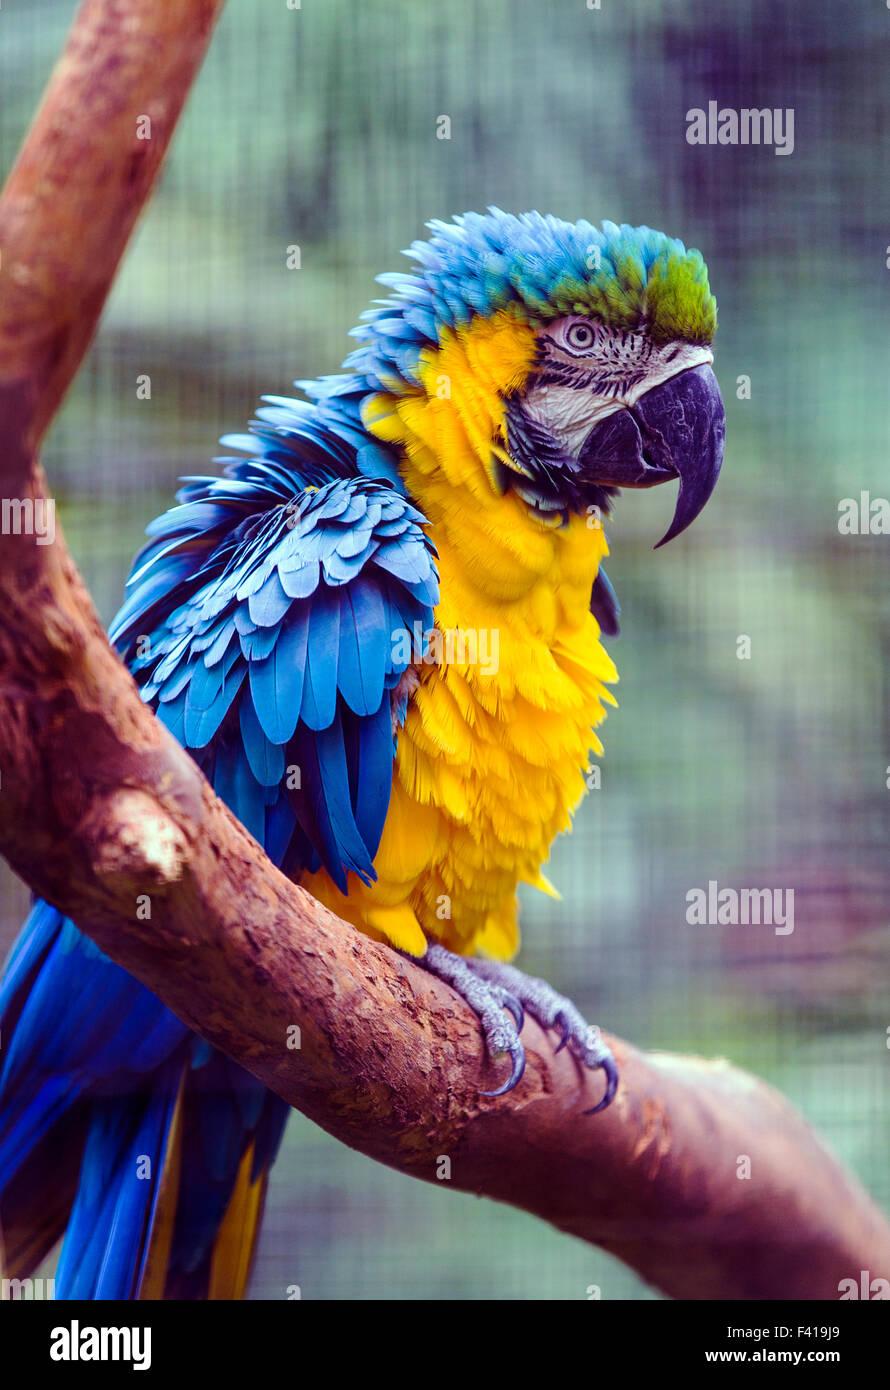 Bunte Papagei, Hawai ' i tropischen botanischen Garten-Naturschutzgebiet; Big Island, Hawaii, USA Stockbild